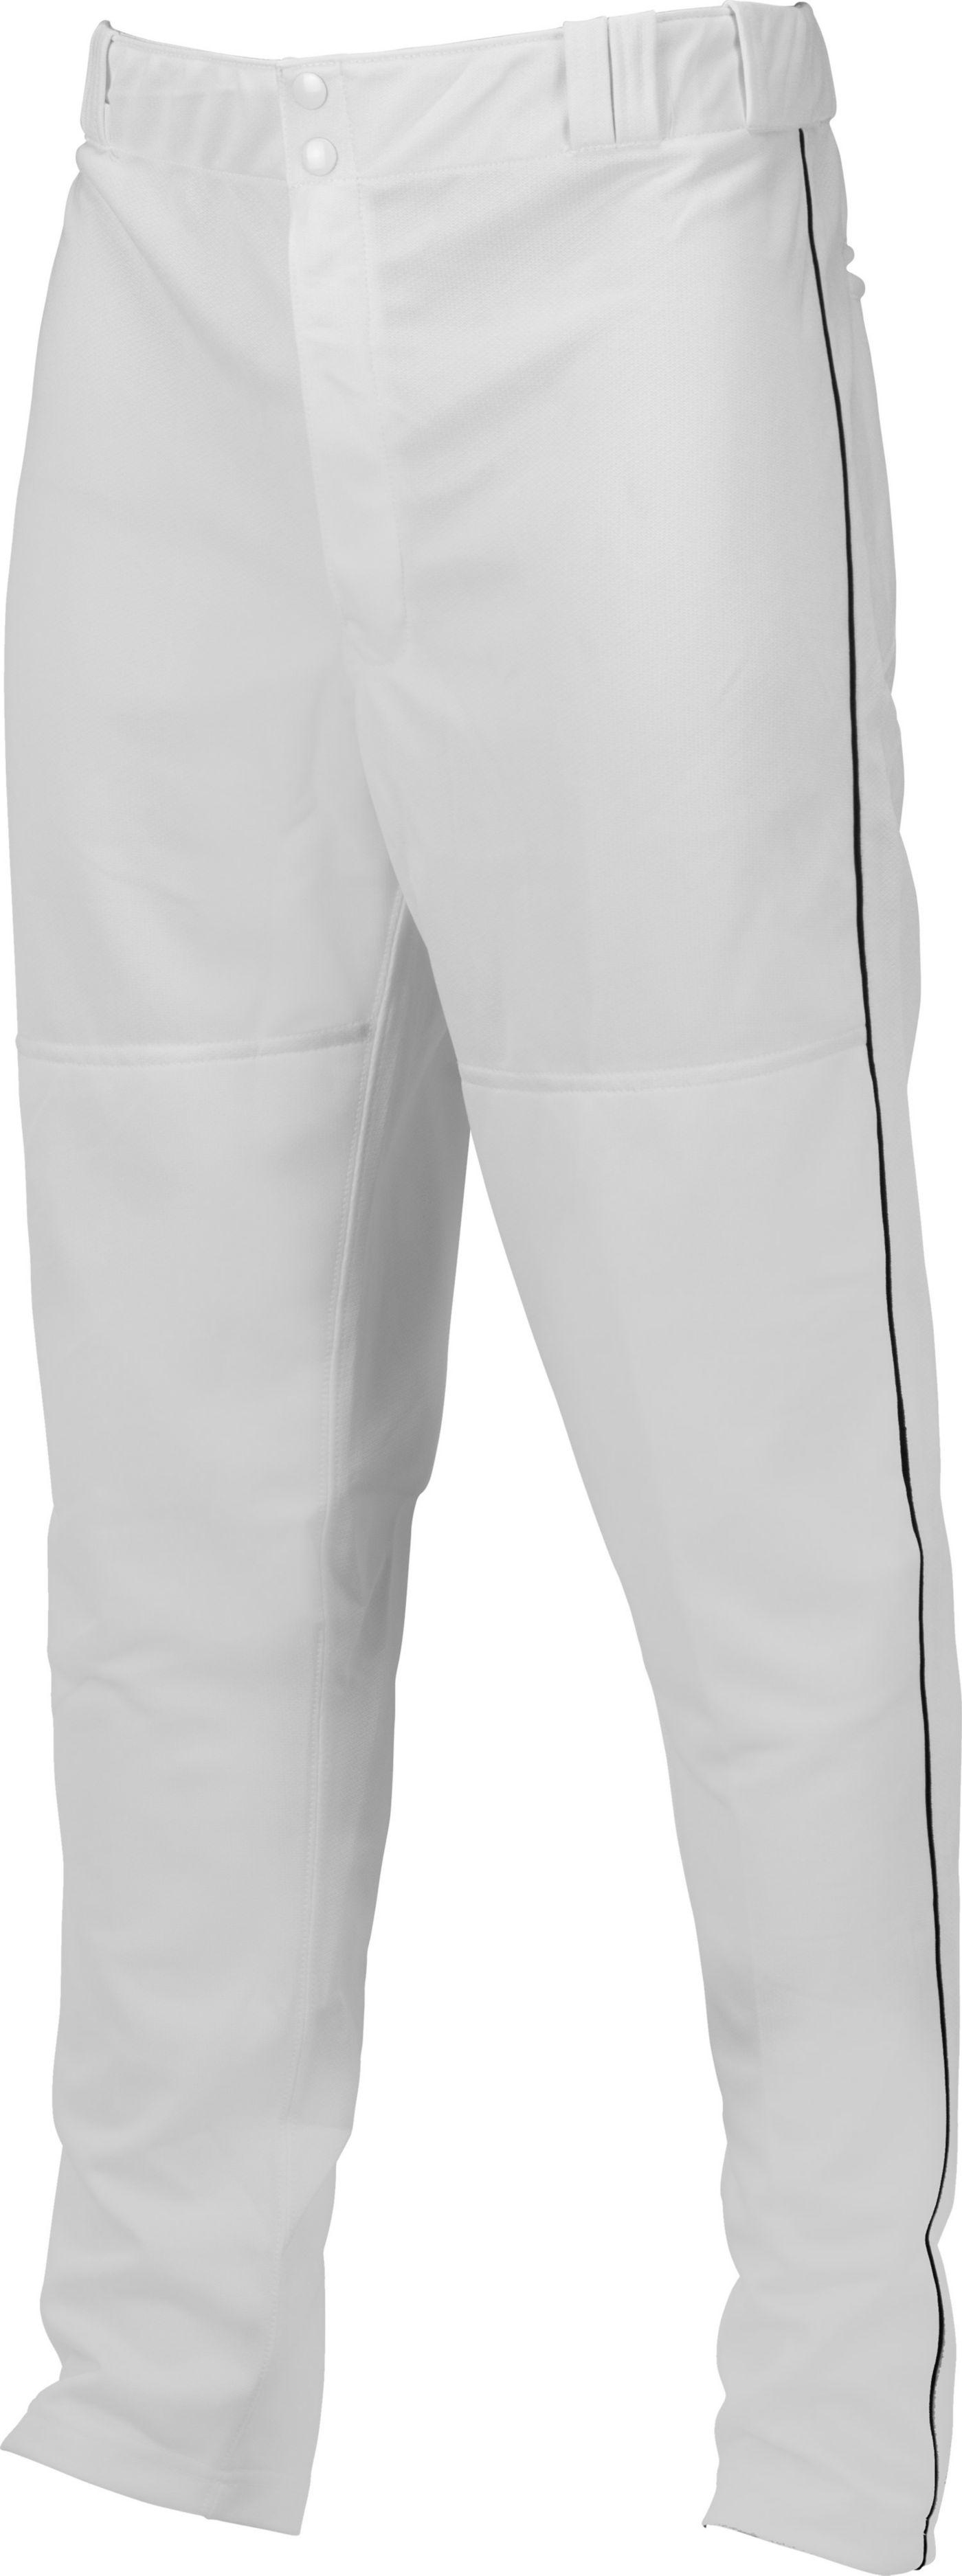 Marucci Men's Double Knit Piped Baseball Pants